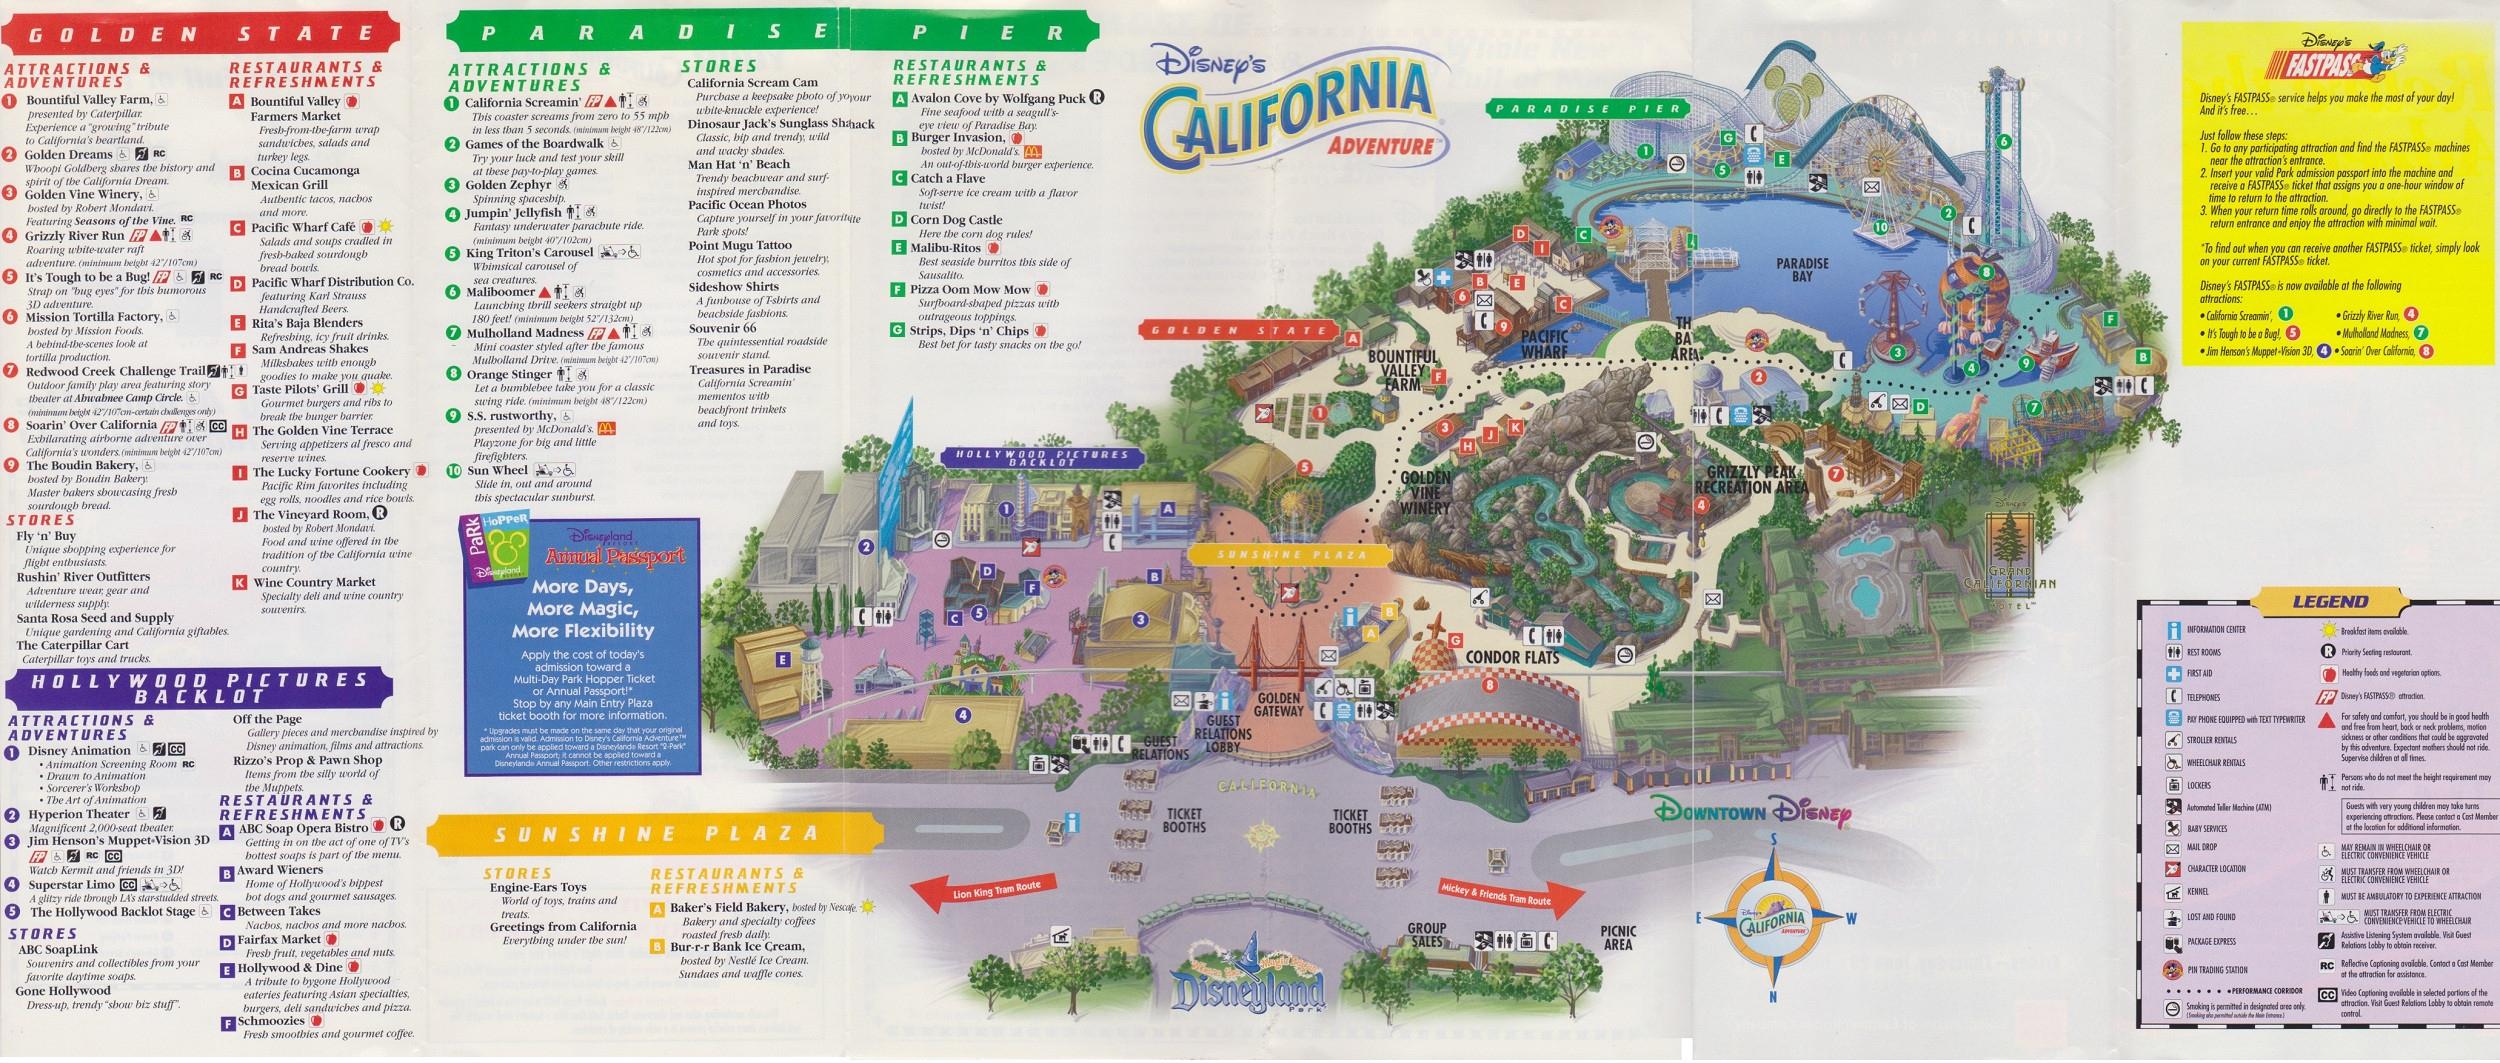 California Adventure Map 2018 Printable Map California California - Disneyland Map 2018 California